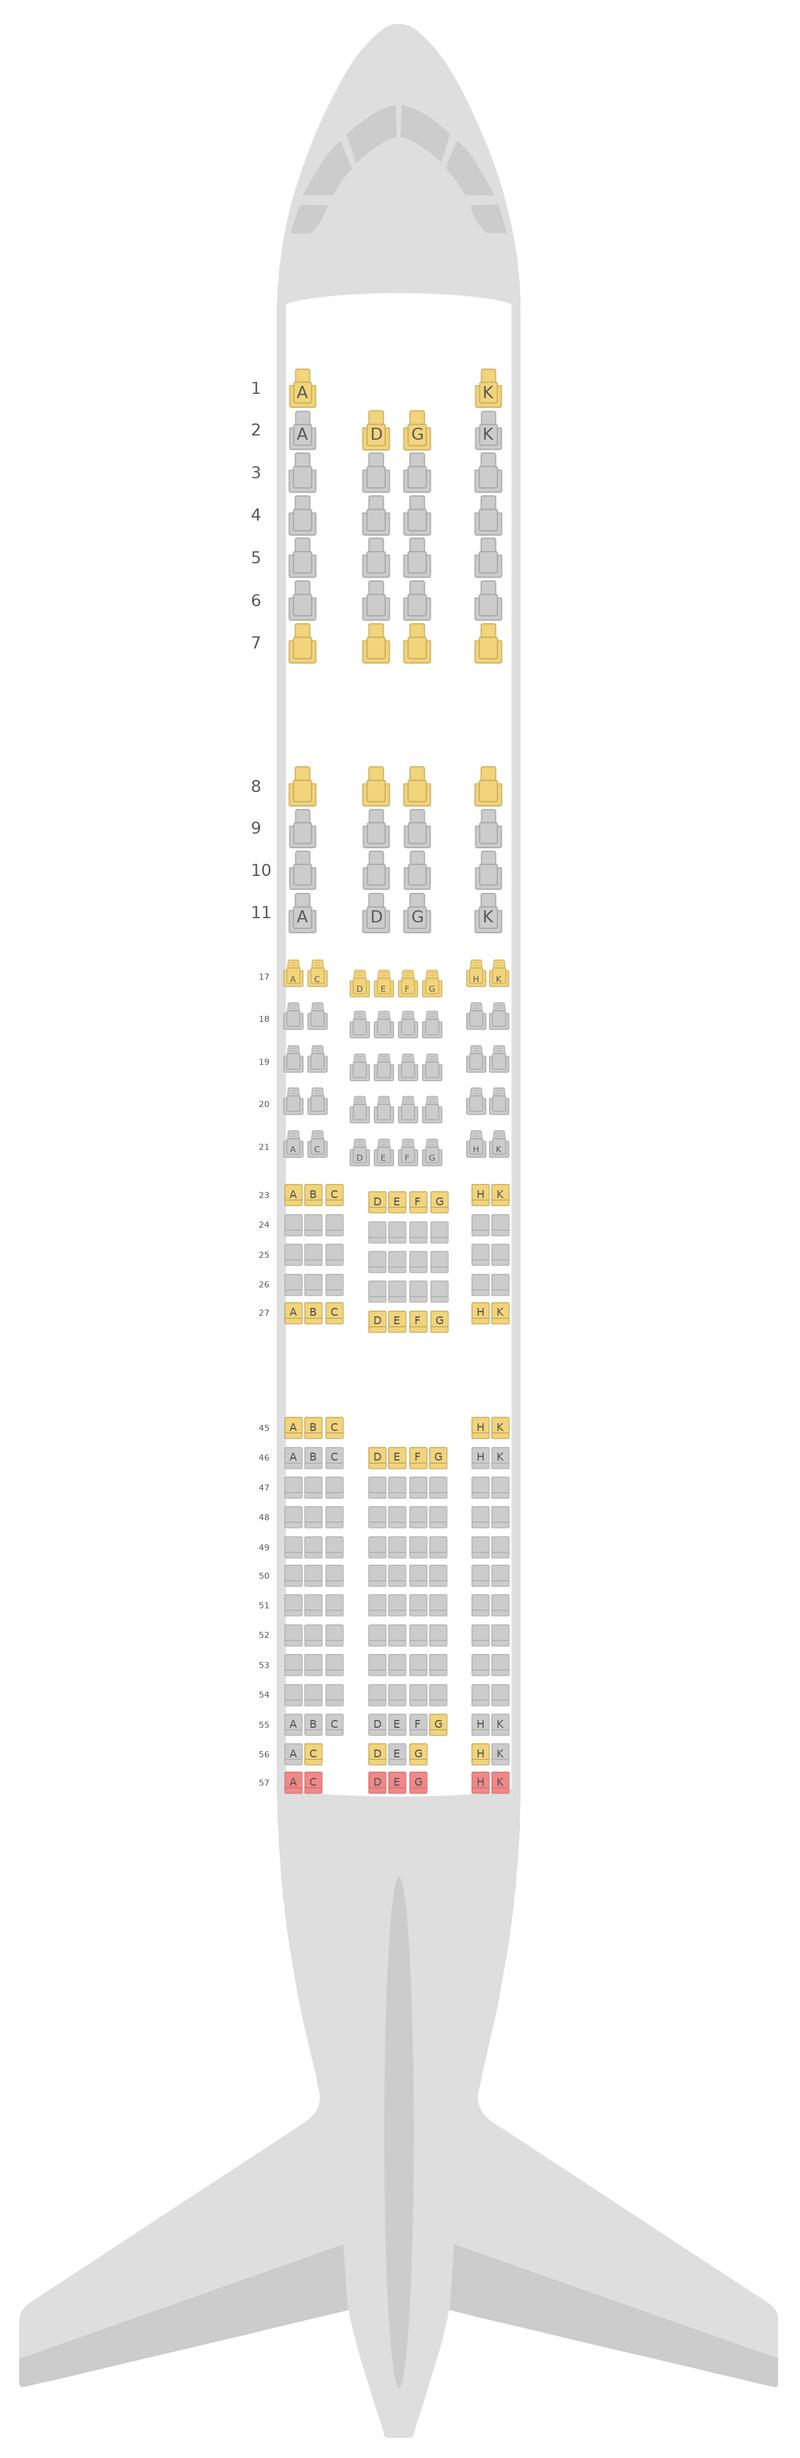 Схема салона Боинг 777-200ER v2 Японские авиалинии